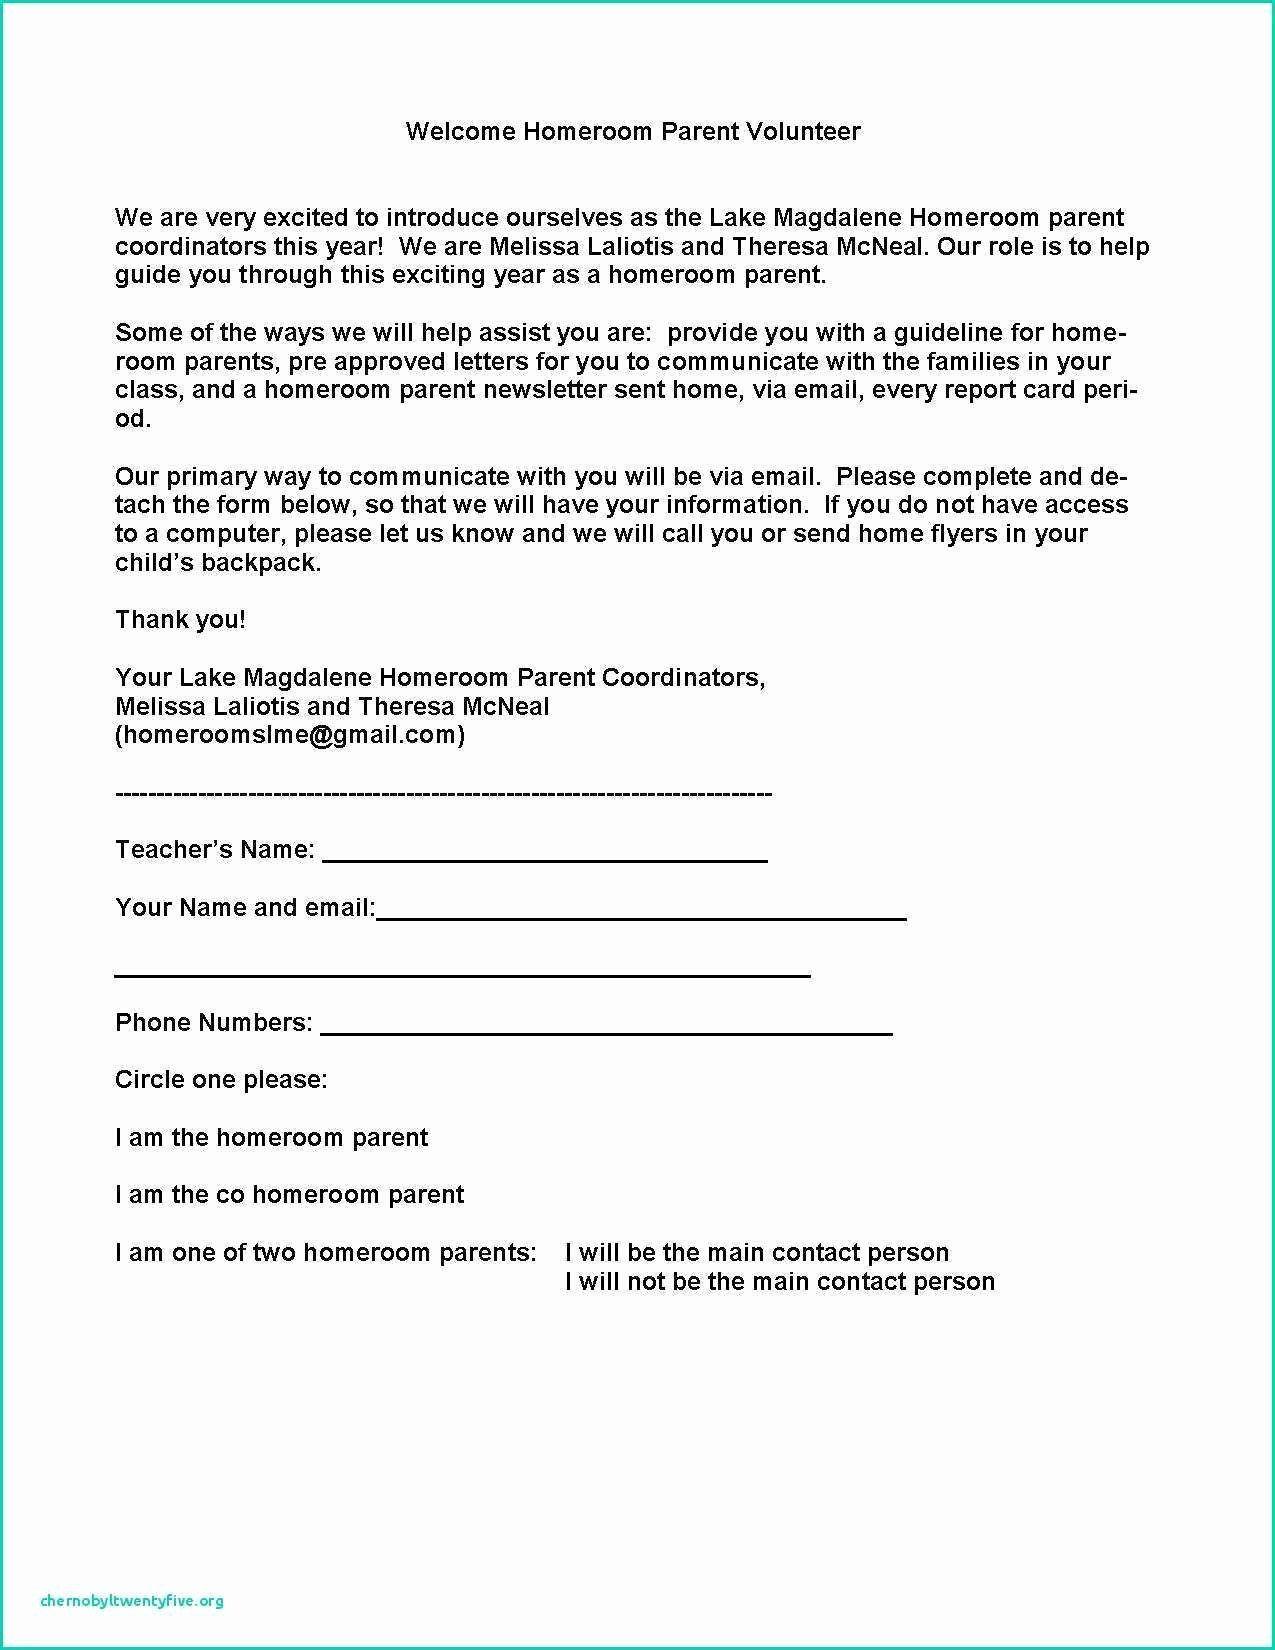 Free Recommendation Letter Template Unique Resume Formal Referencer Template Leterformat P Personal Reference Letter Reference Letter Template Reference Letter